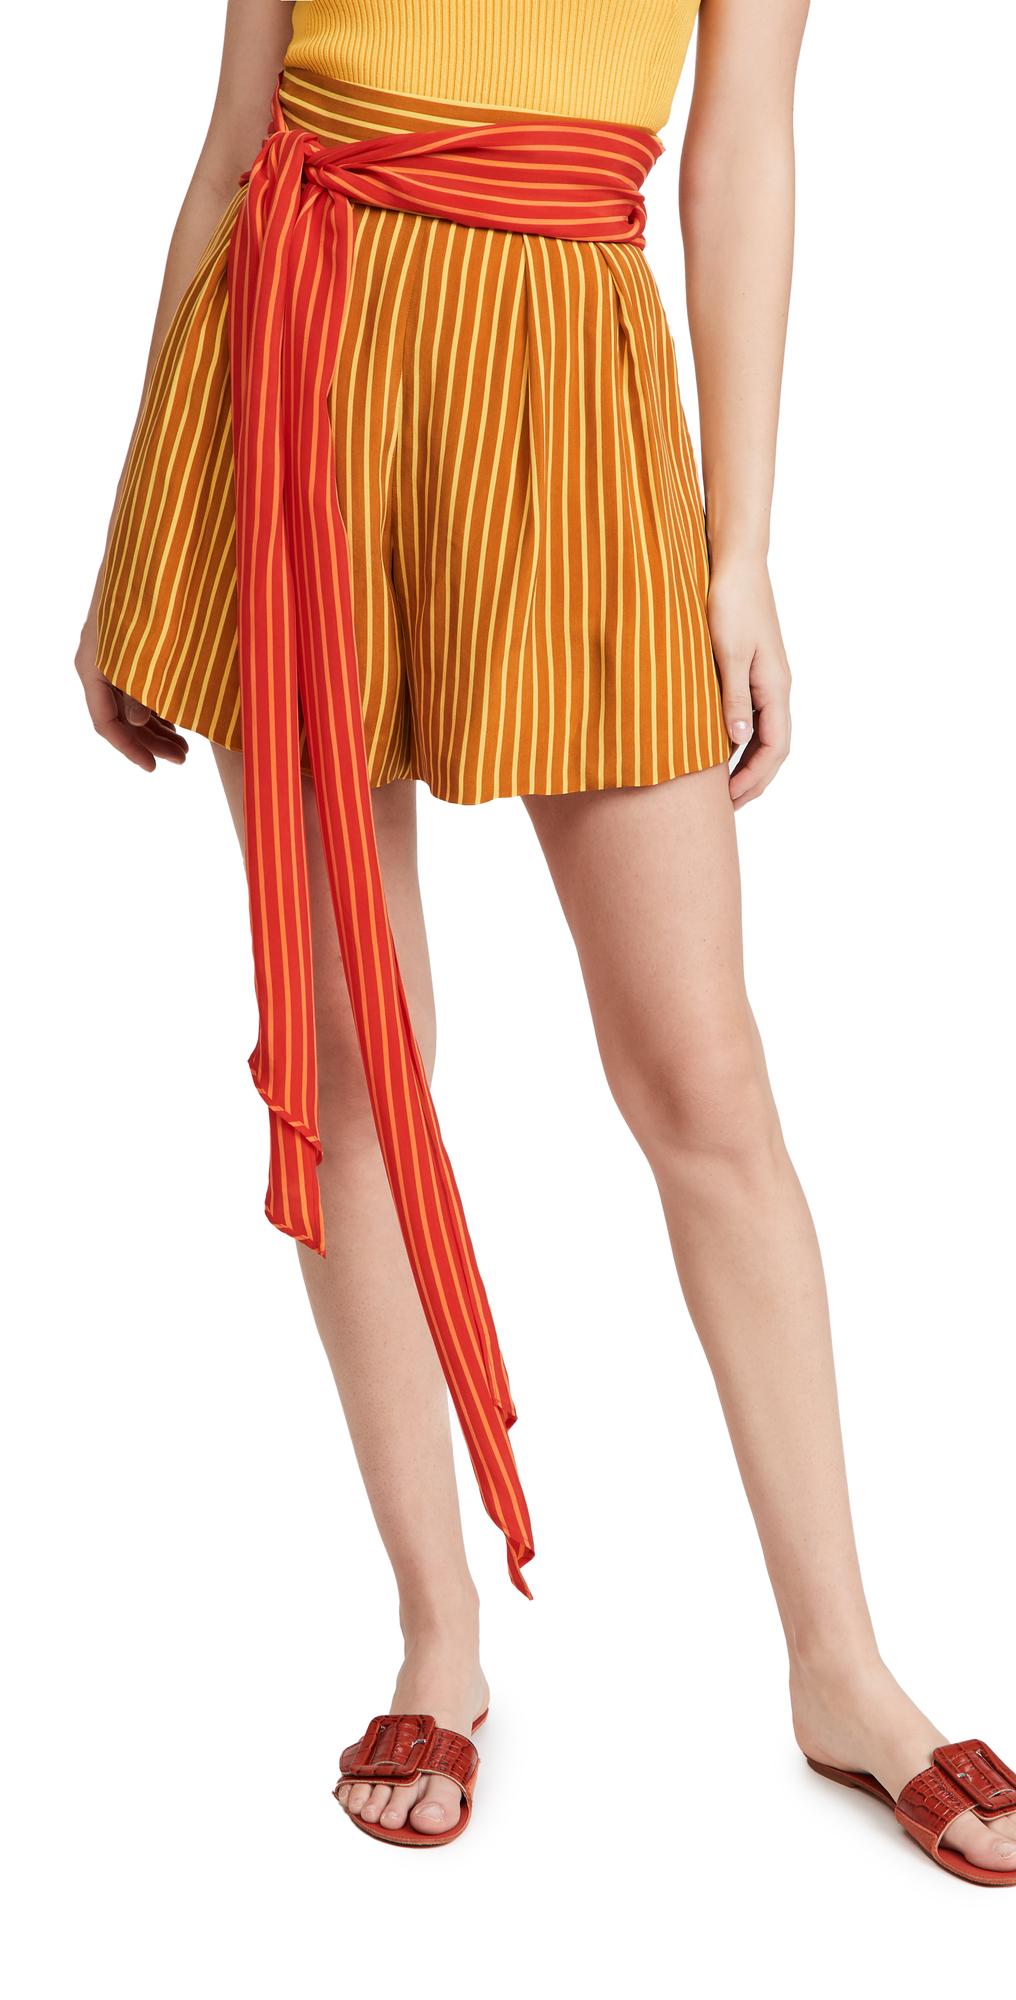 Leonora Mini Shorts